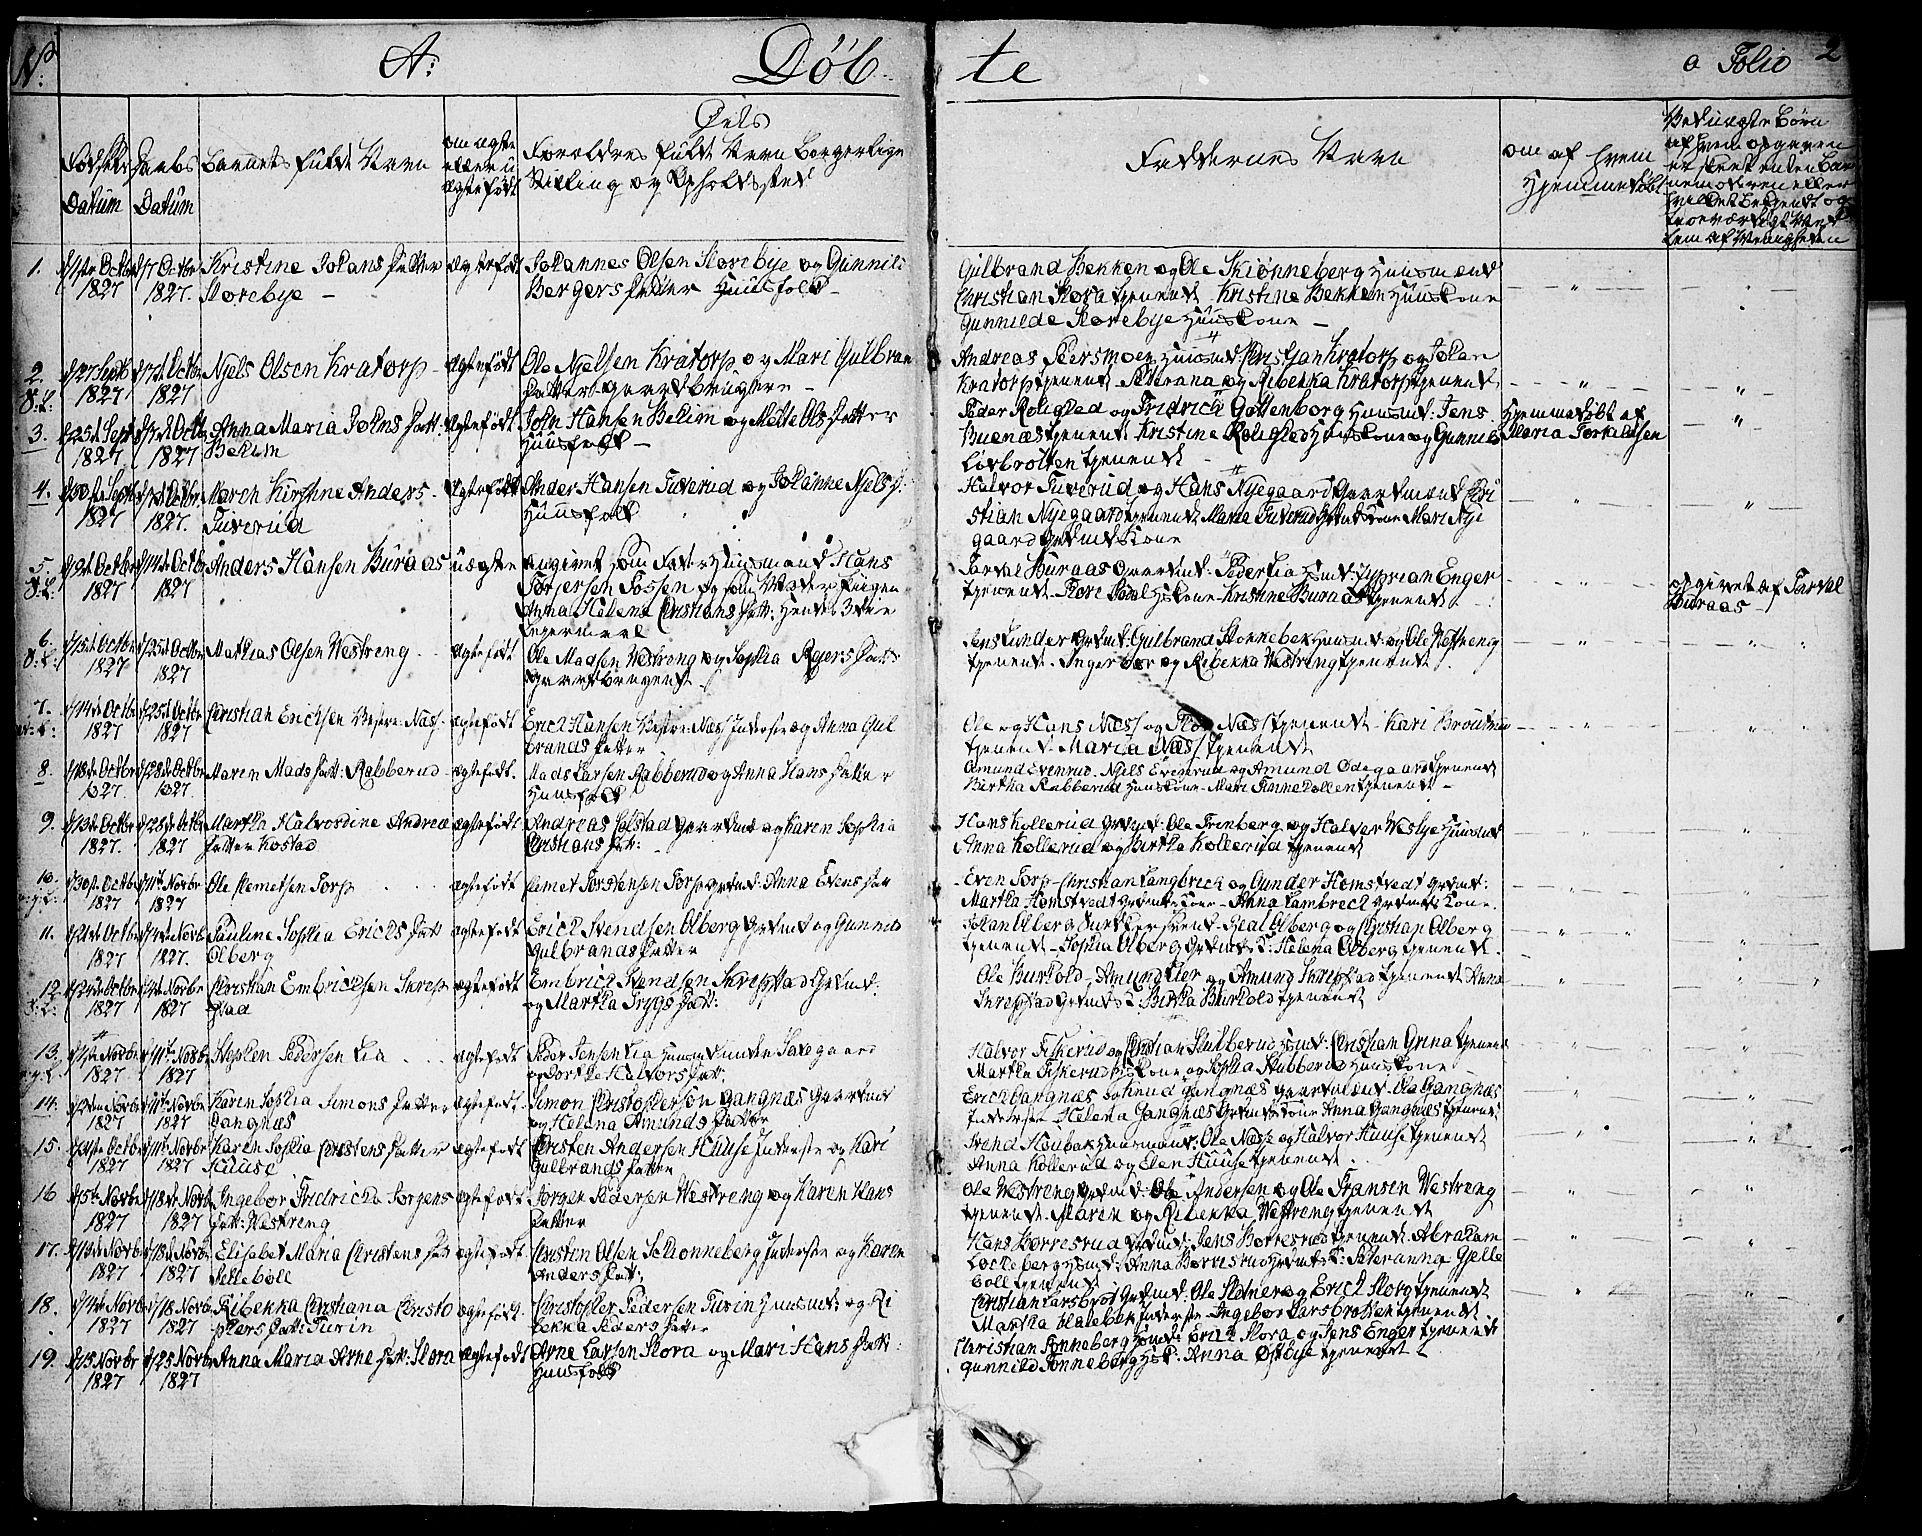 SAO, Høland prestekontor Kirkebøker, F/Fa/L0008: Ministerialbok nr. I 8, 1827-1845, s. 2